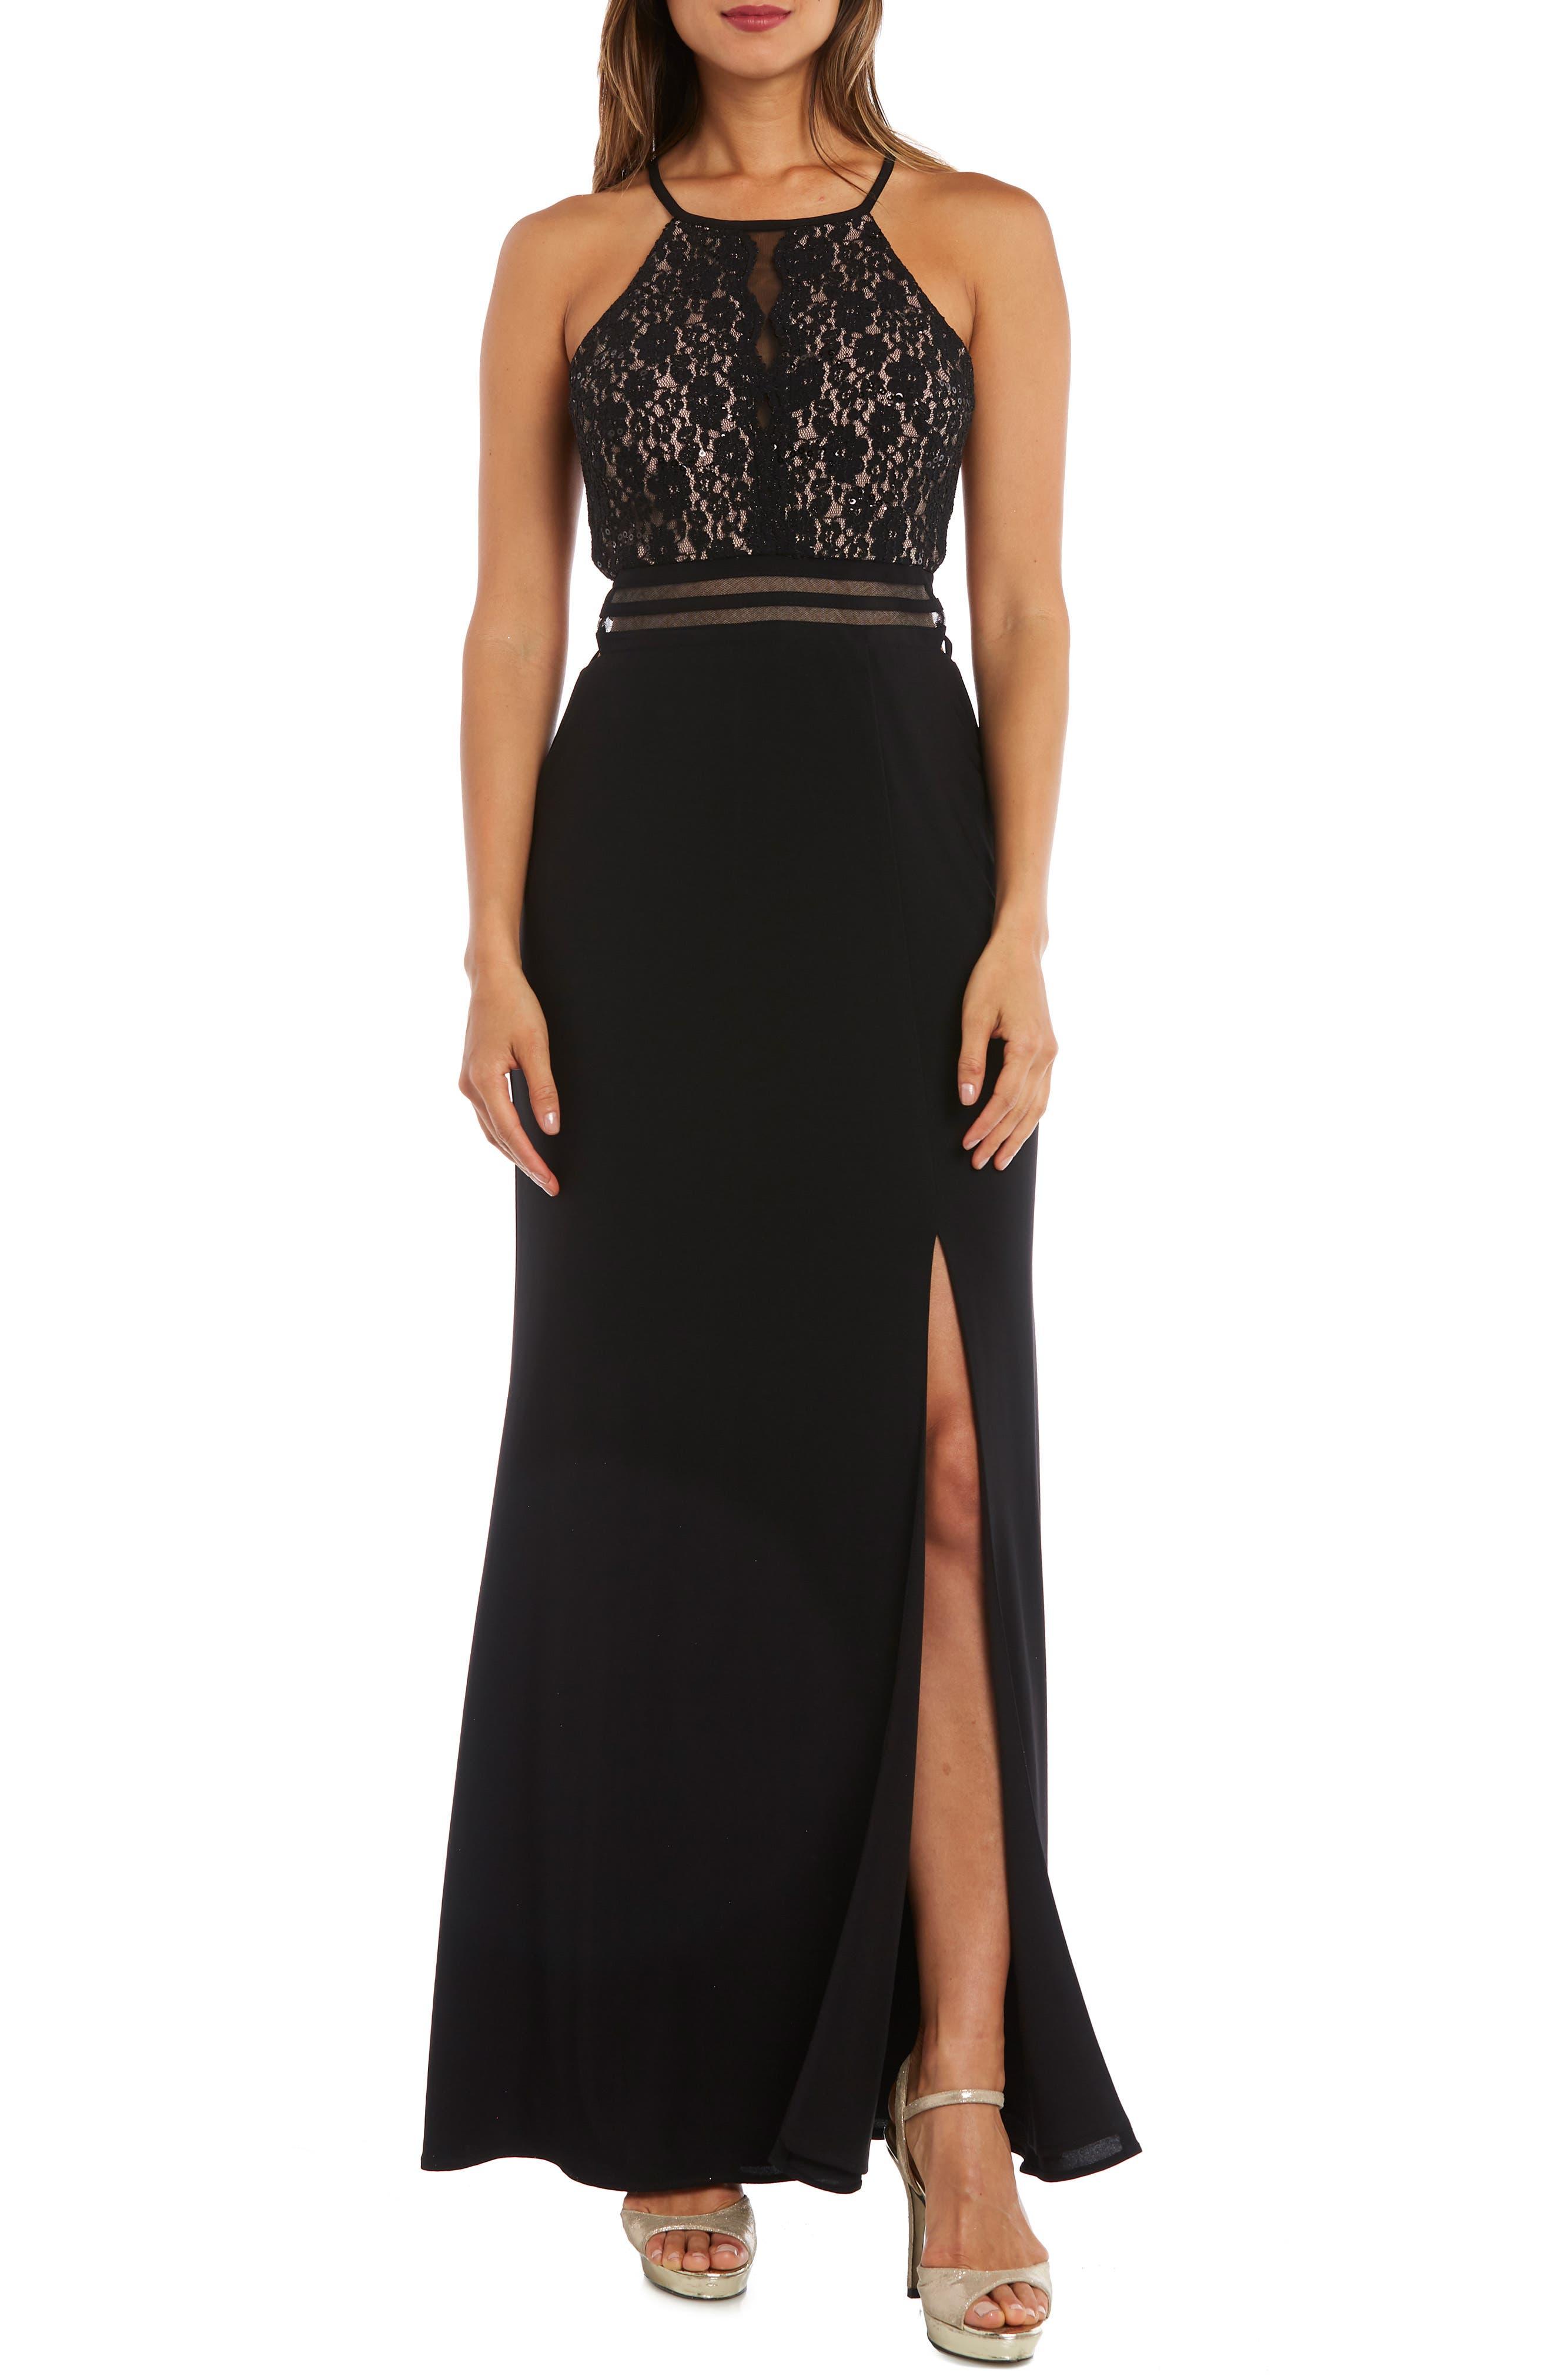 MORGAN & CO. Strappy Lace Bodice Gown, Main, color, BLACK/ NUDE